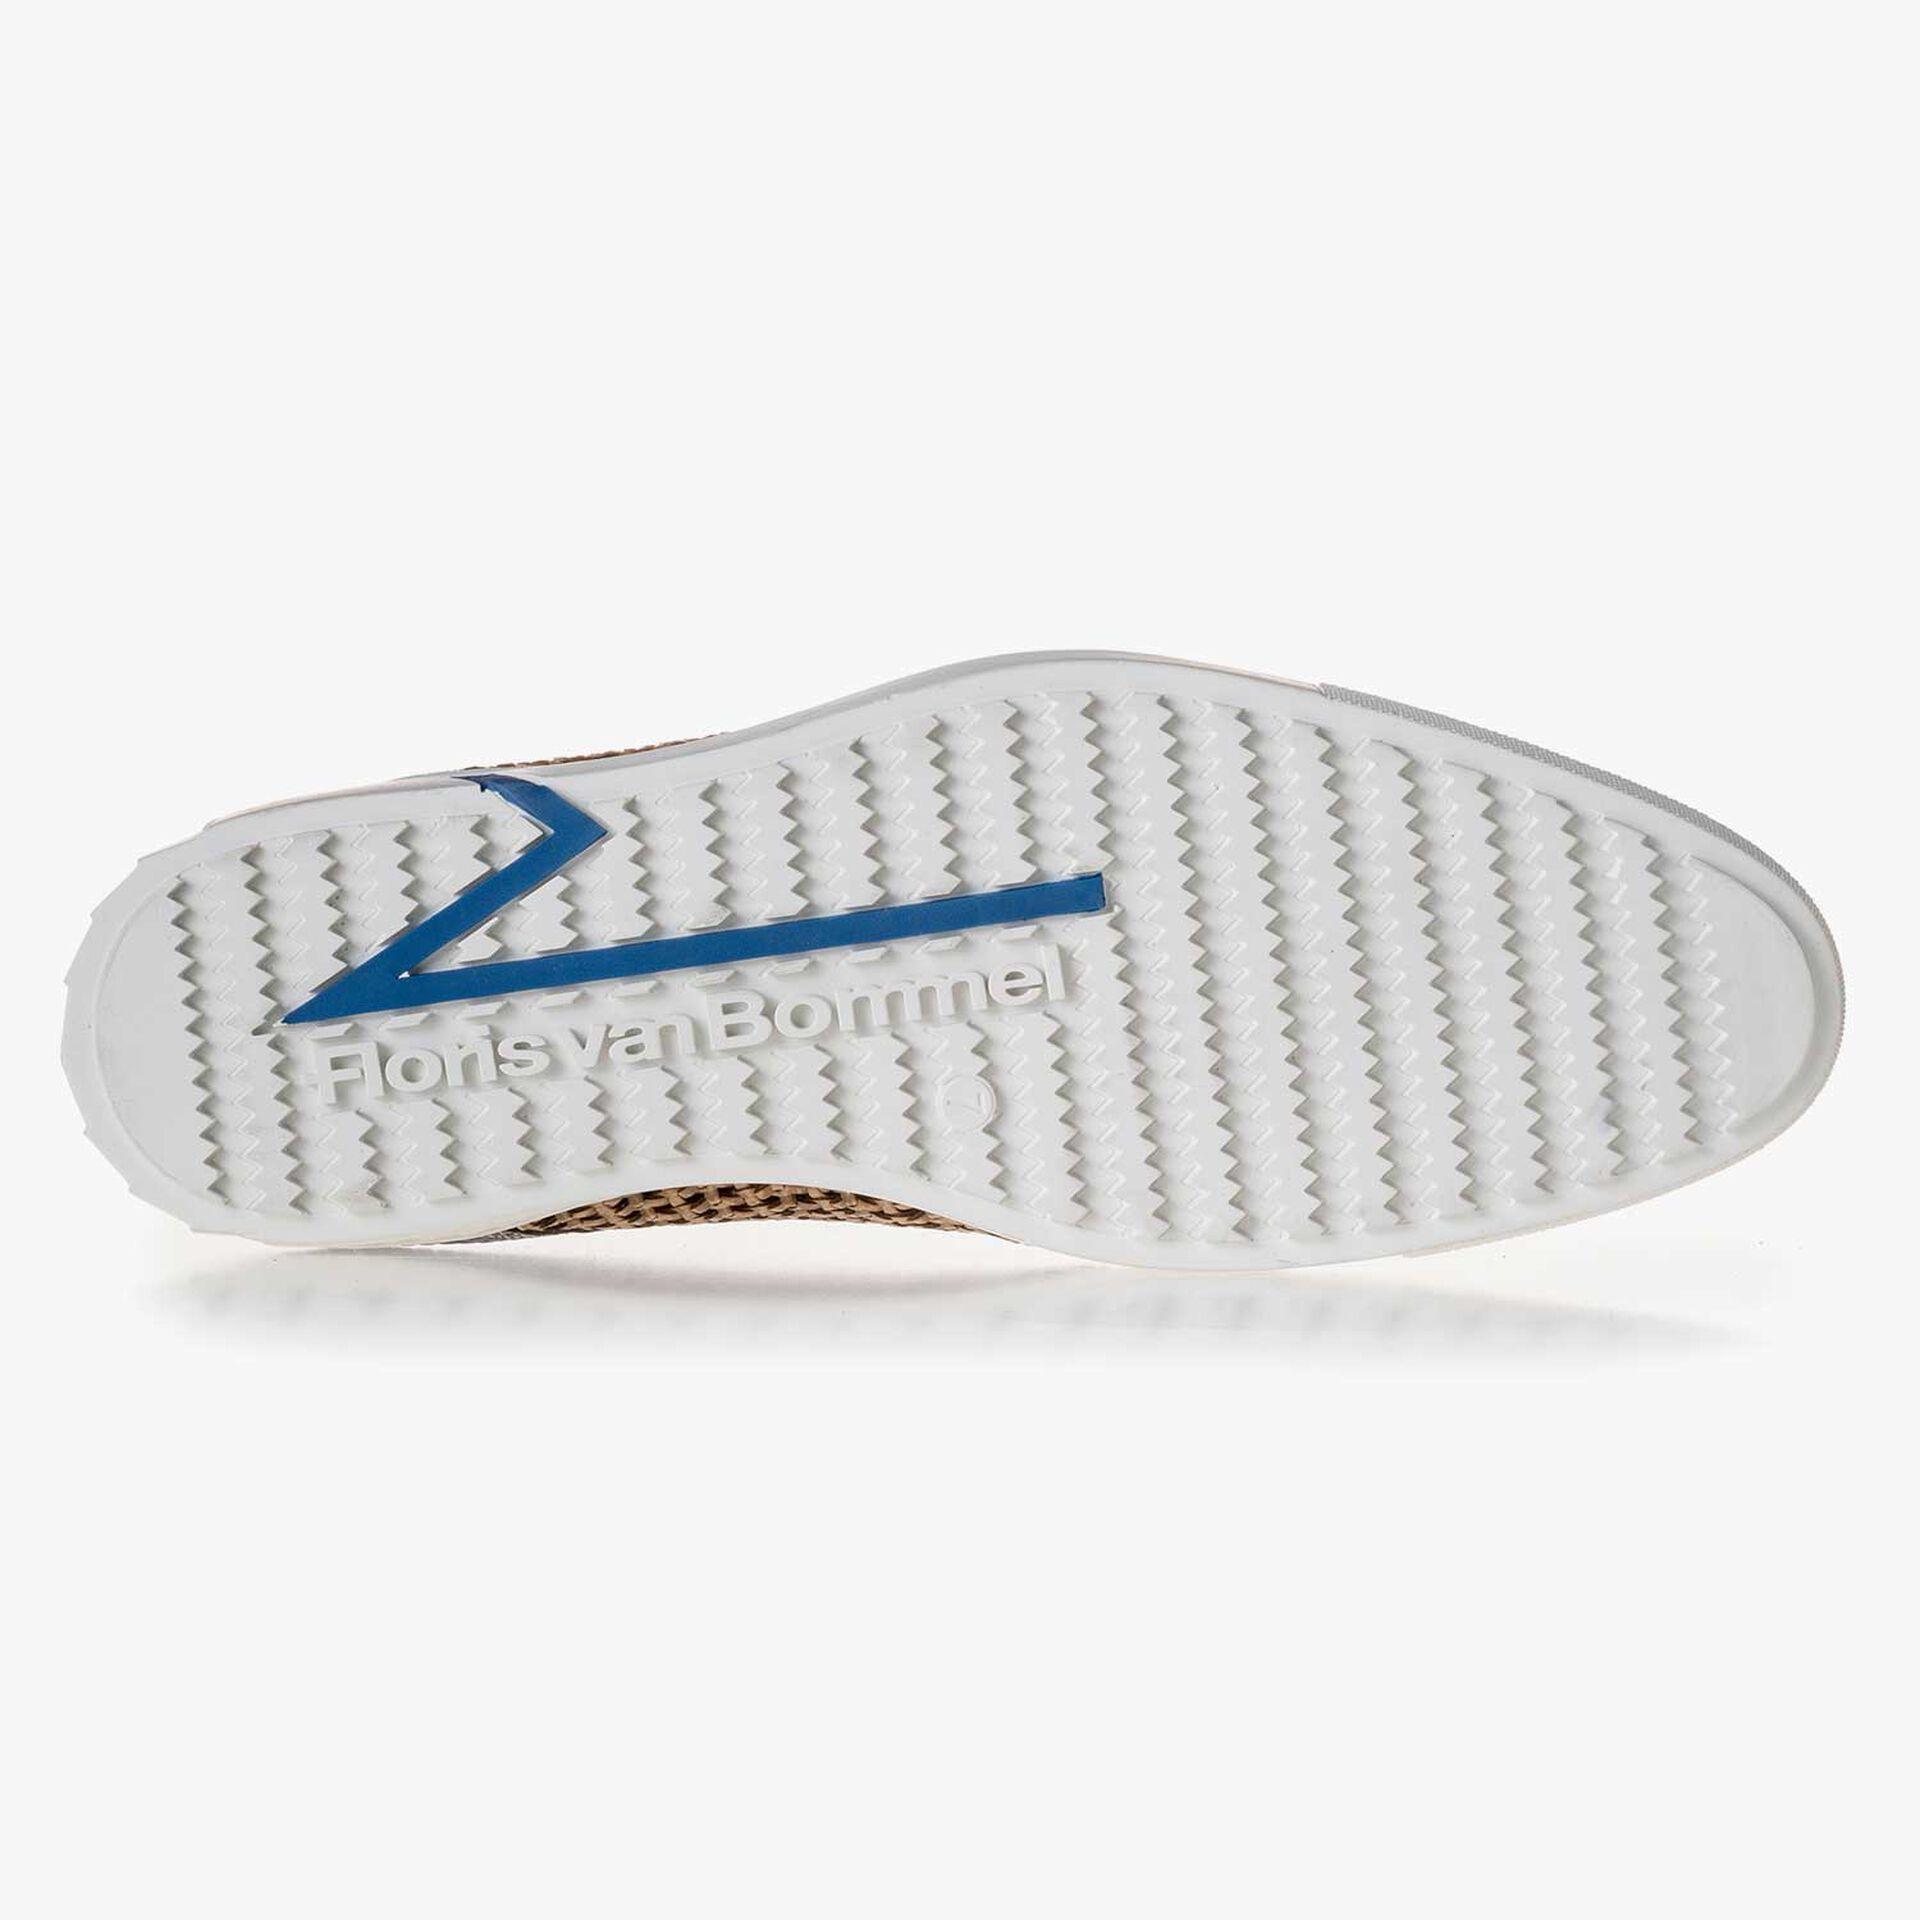 Premium blue braided leather sneaker